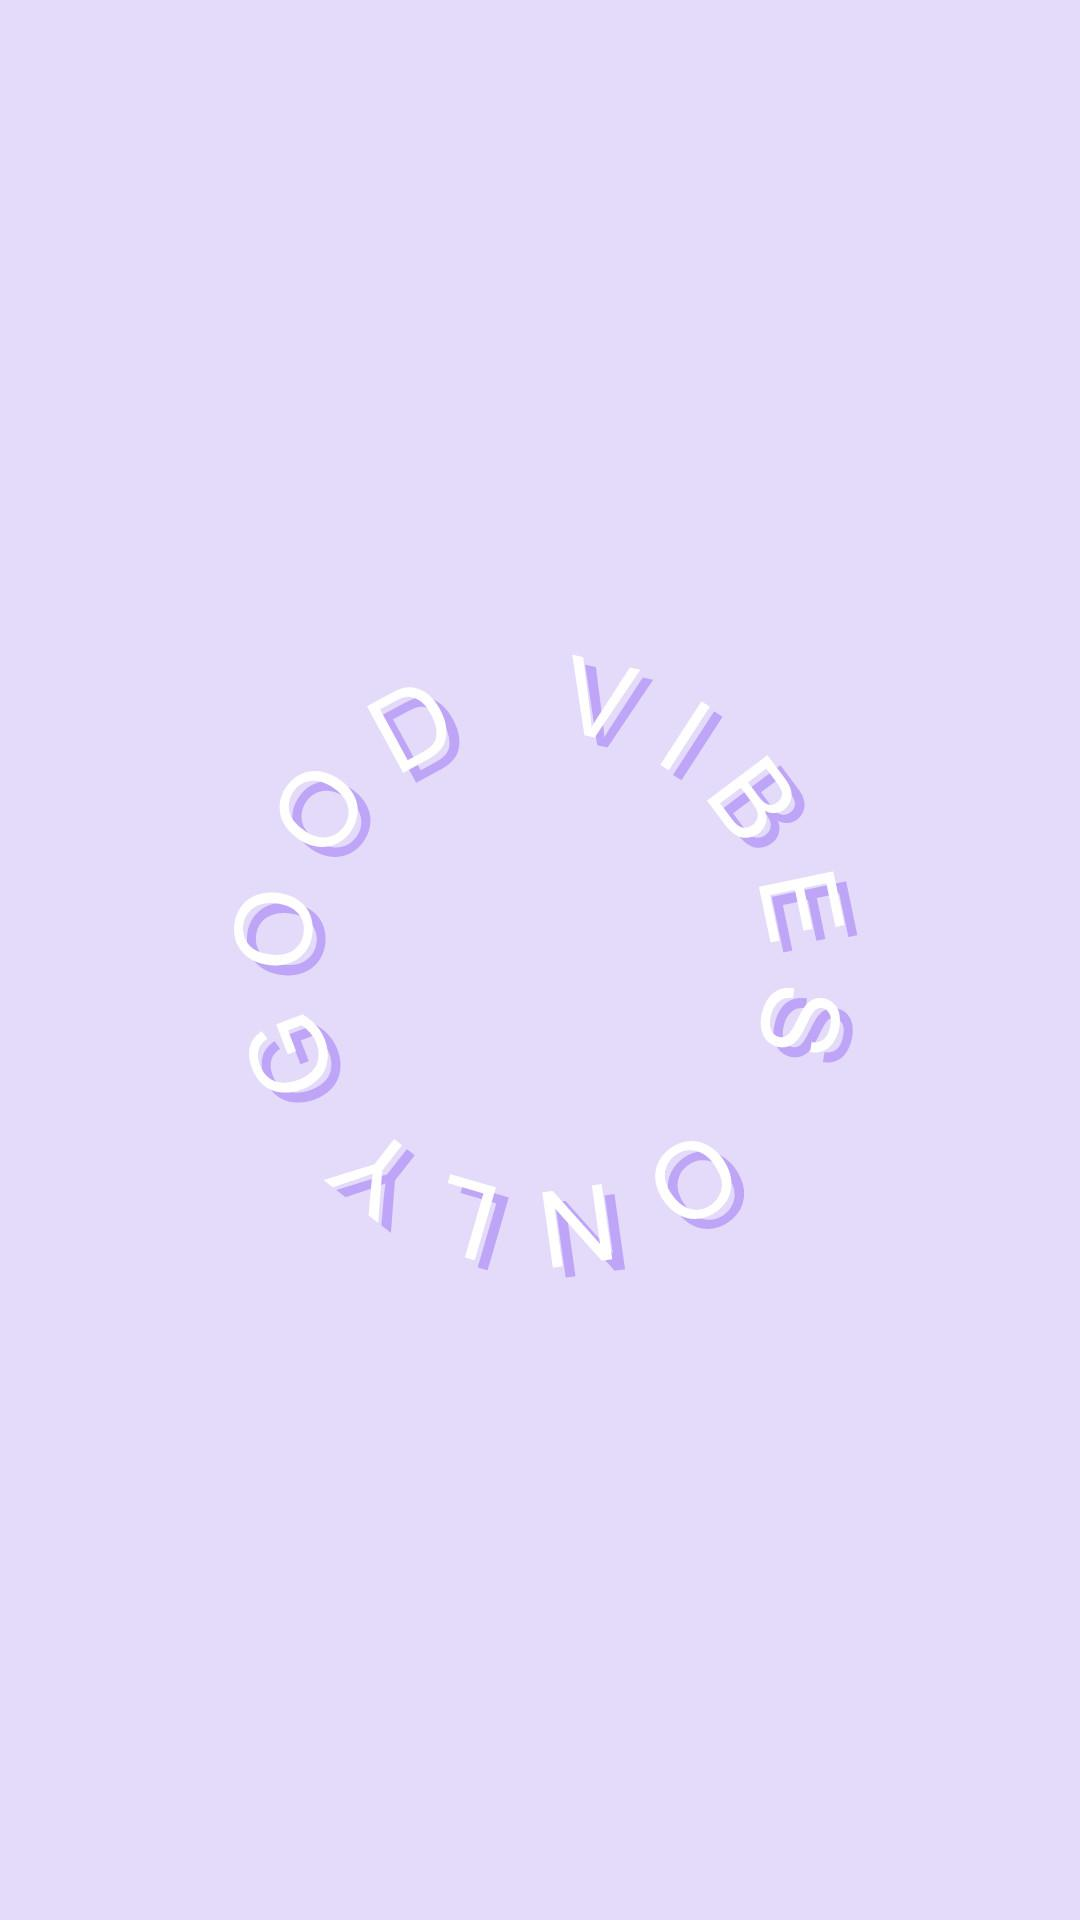 Aesthetic Good Vibes Wallpaper Largest Wallpaper Portal